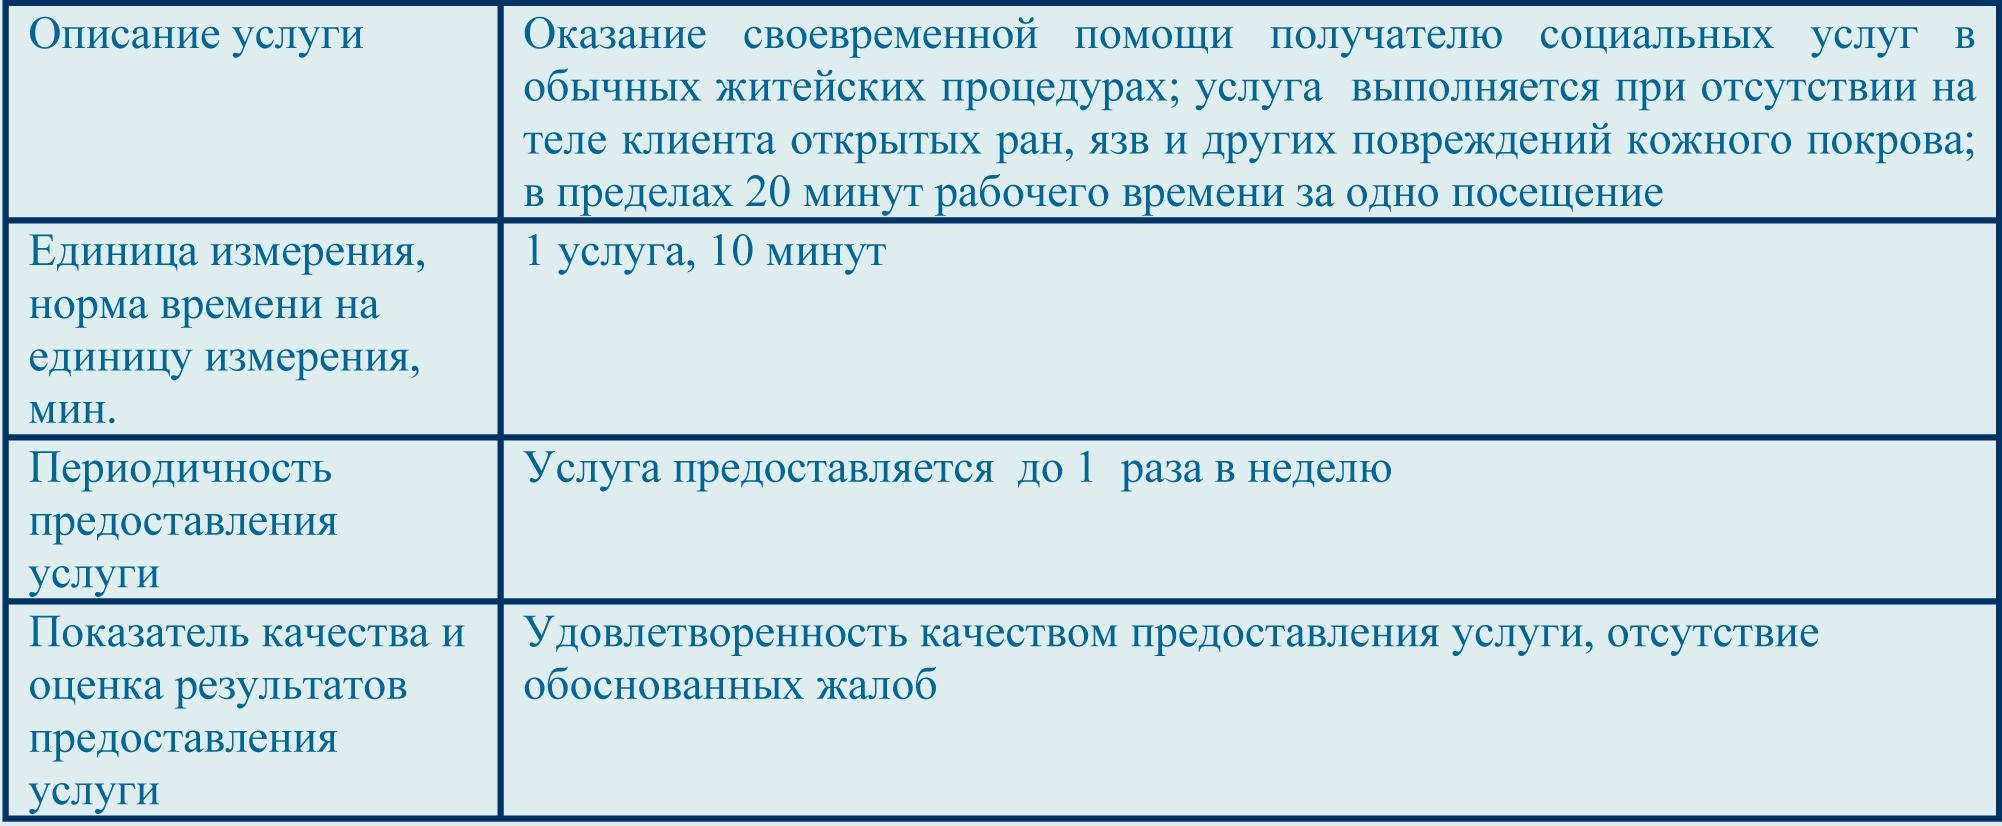 opisanie-uslug-csonekl5